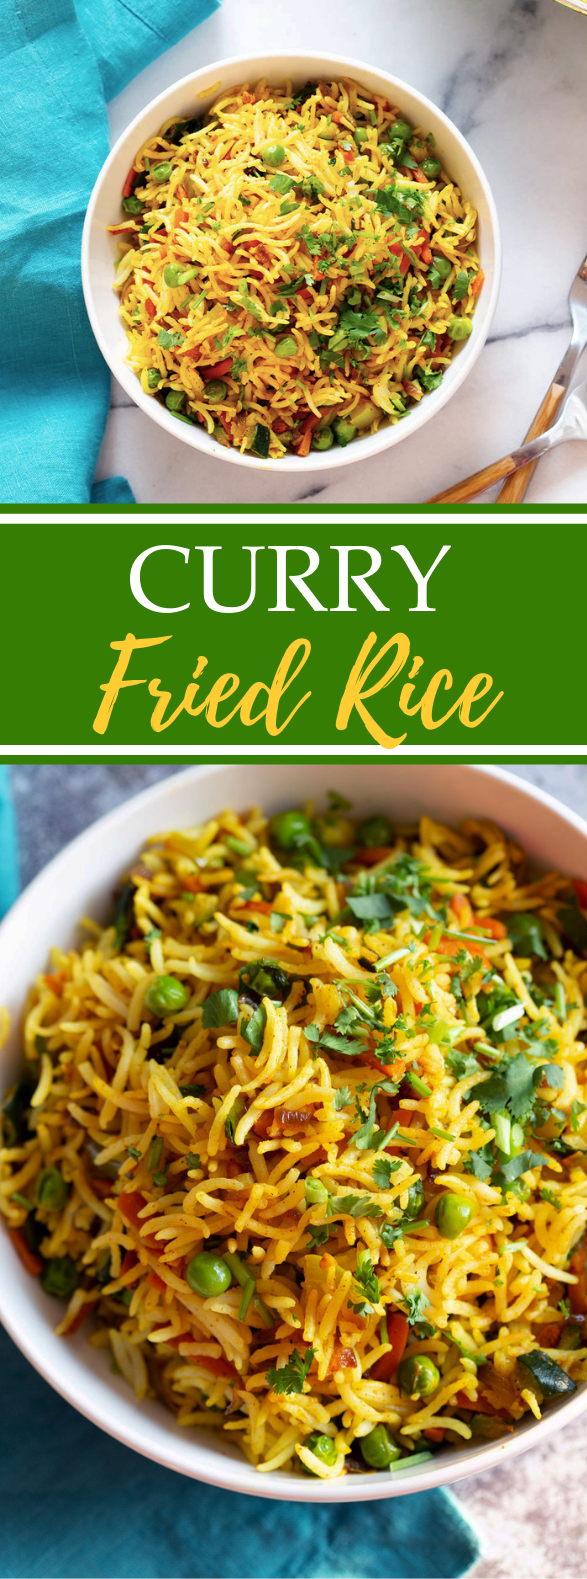 Curry Fried Rice #vegetarian #vegan